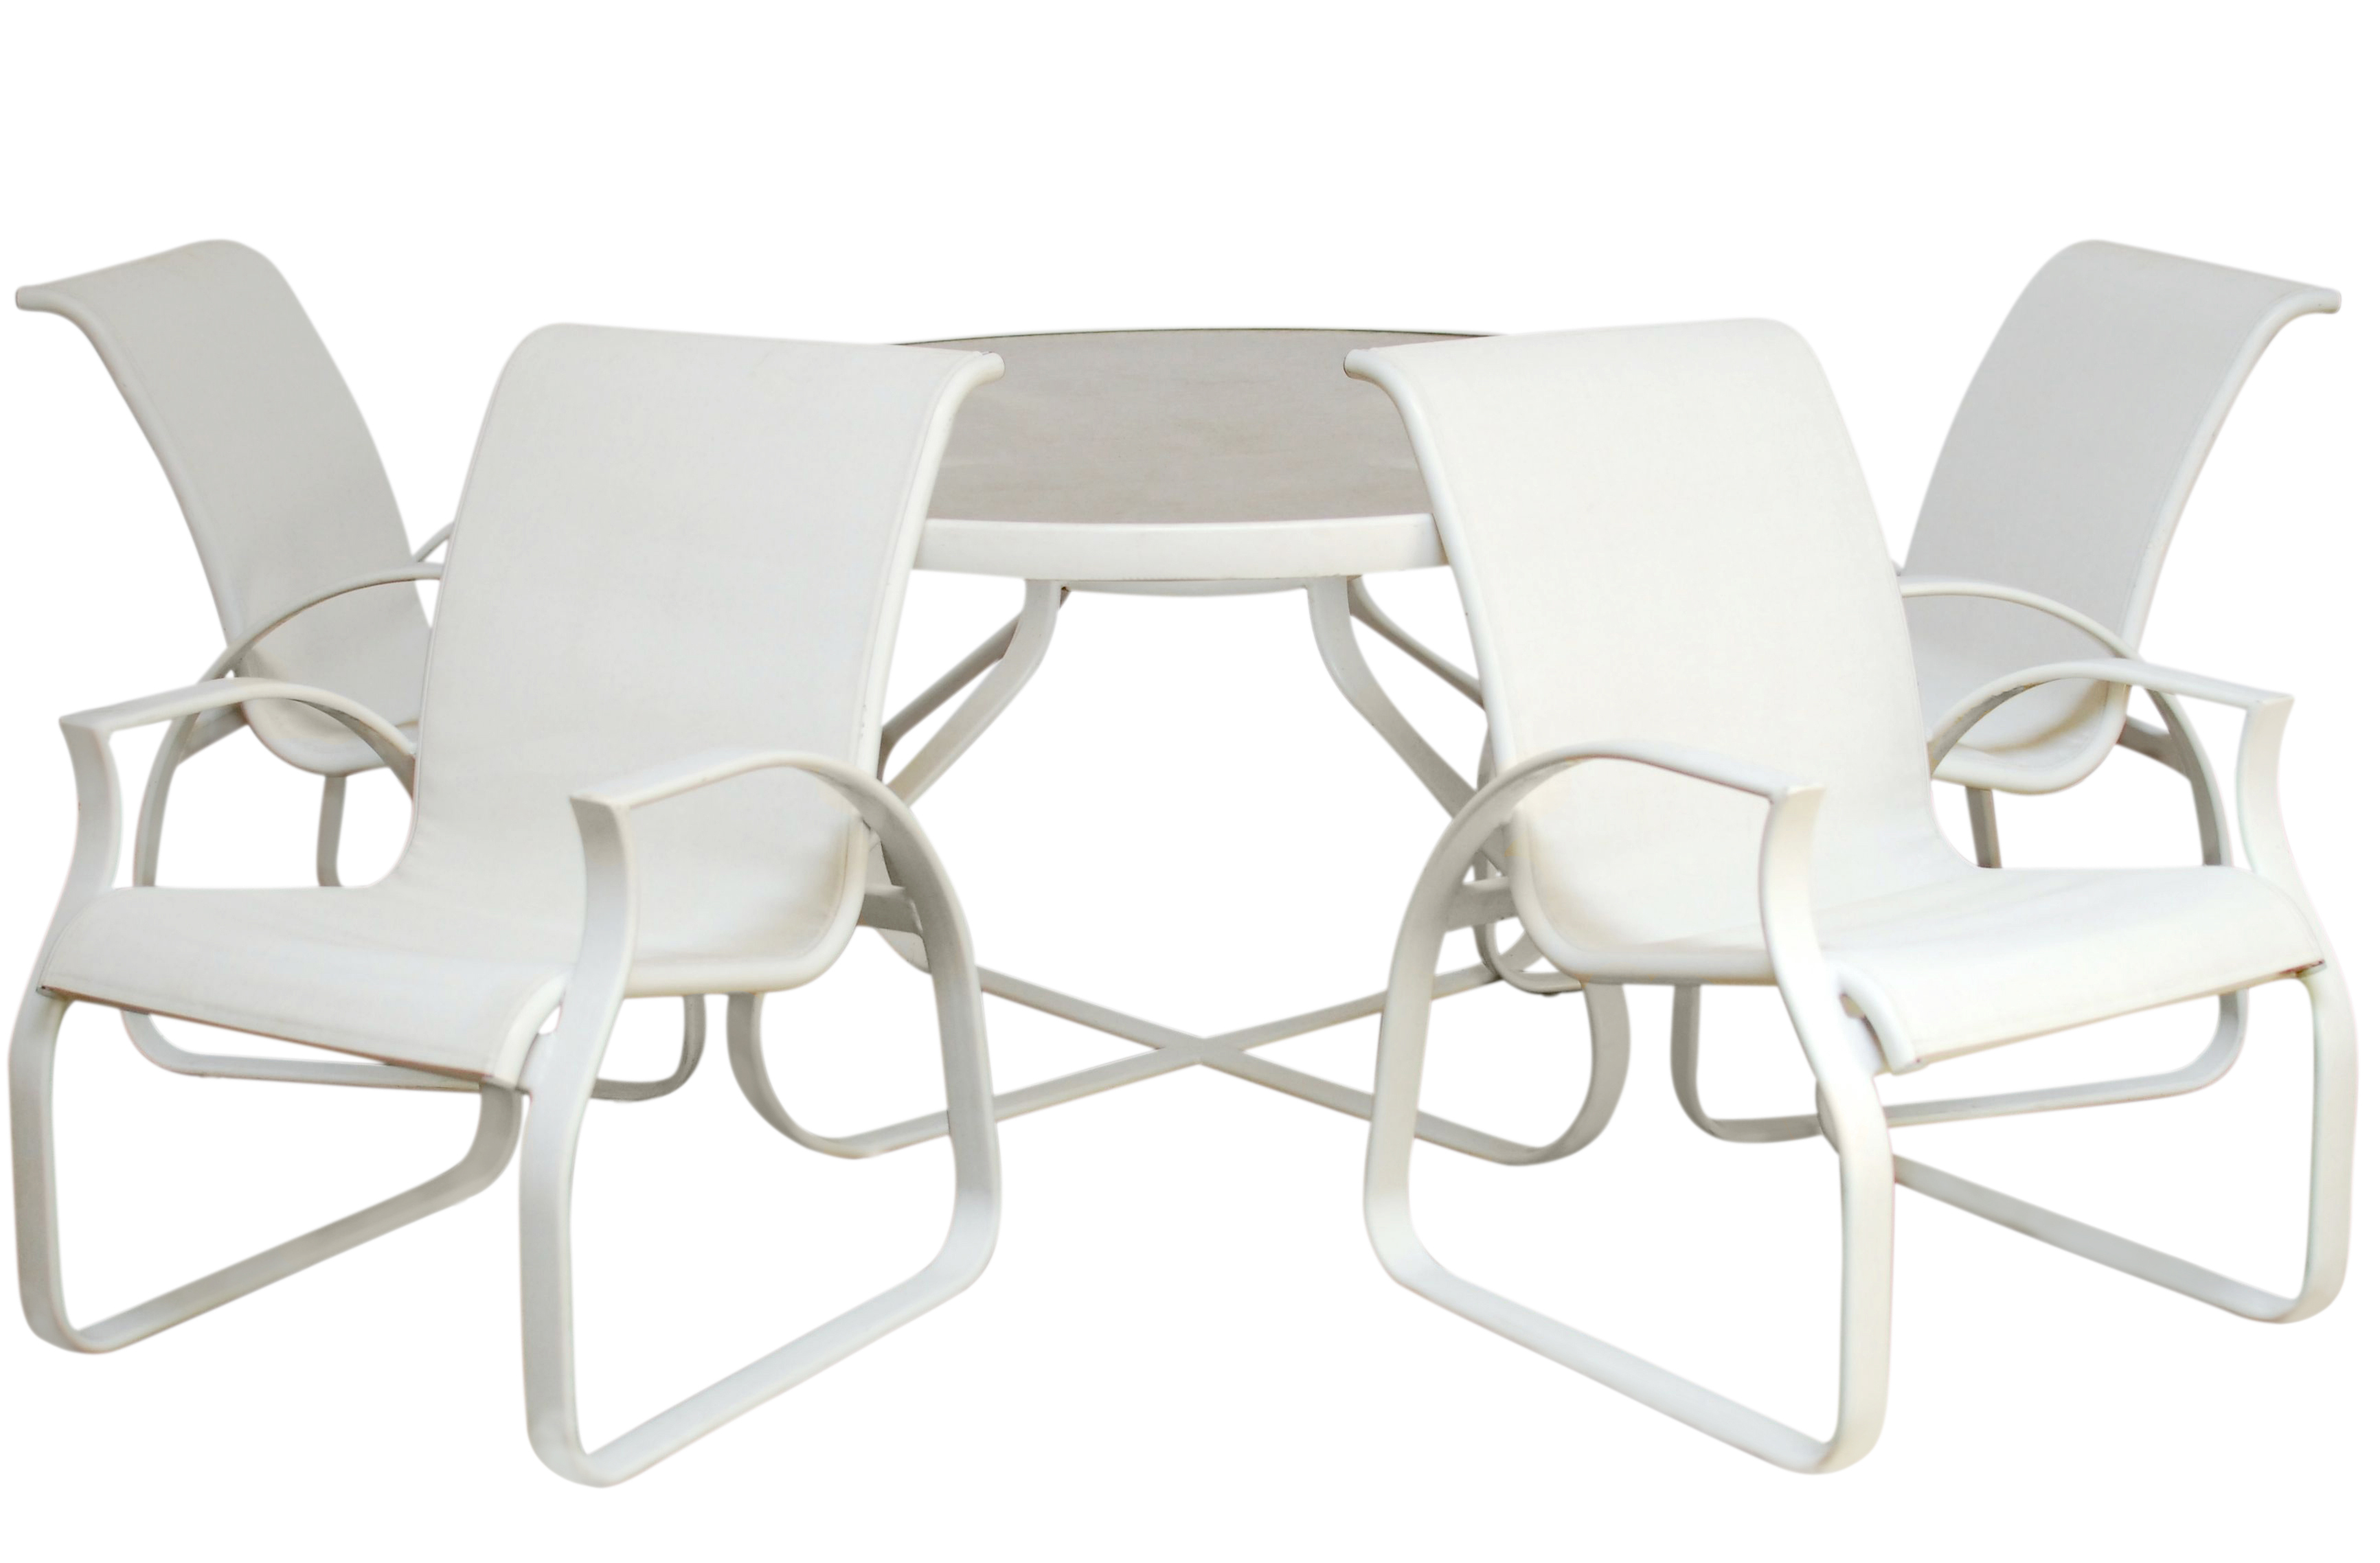 MidCentury Modern Tropitone Patio Furniture Set Chairish - Tropitone outdoor furniture